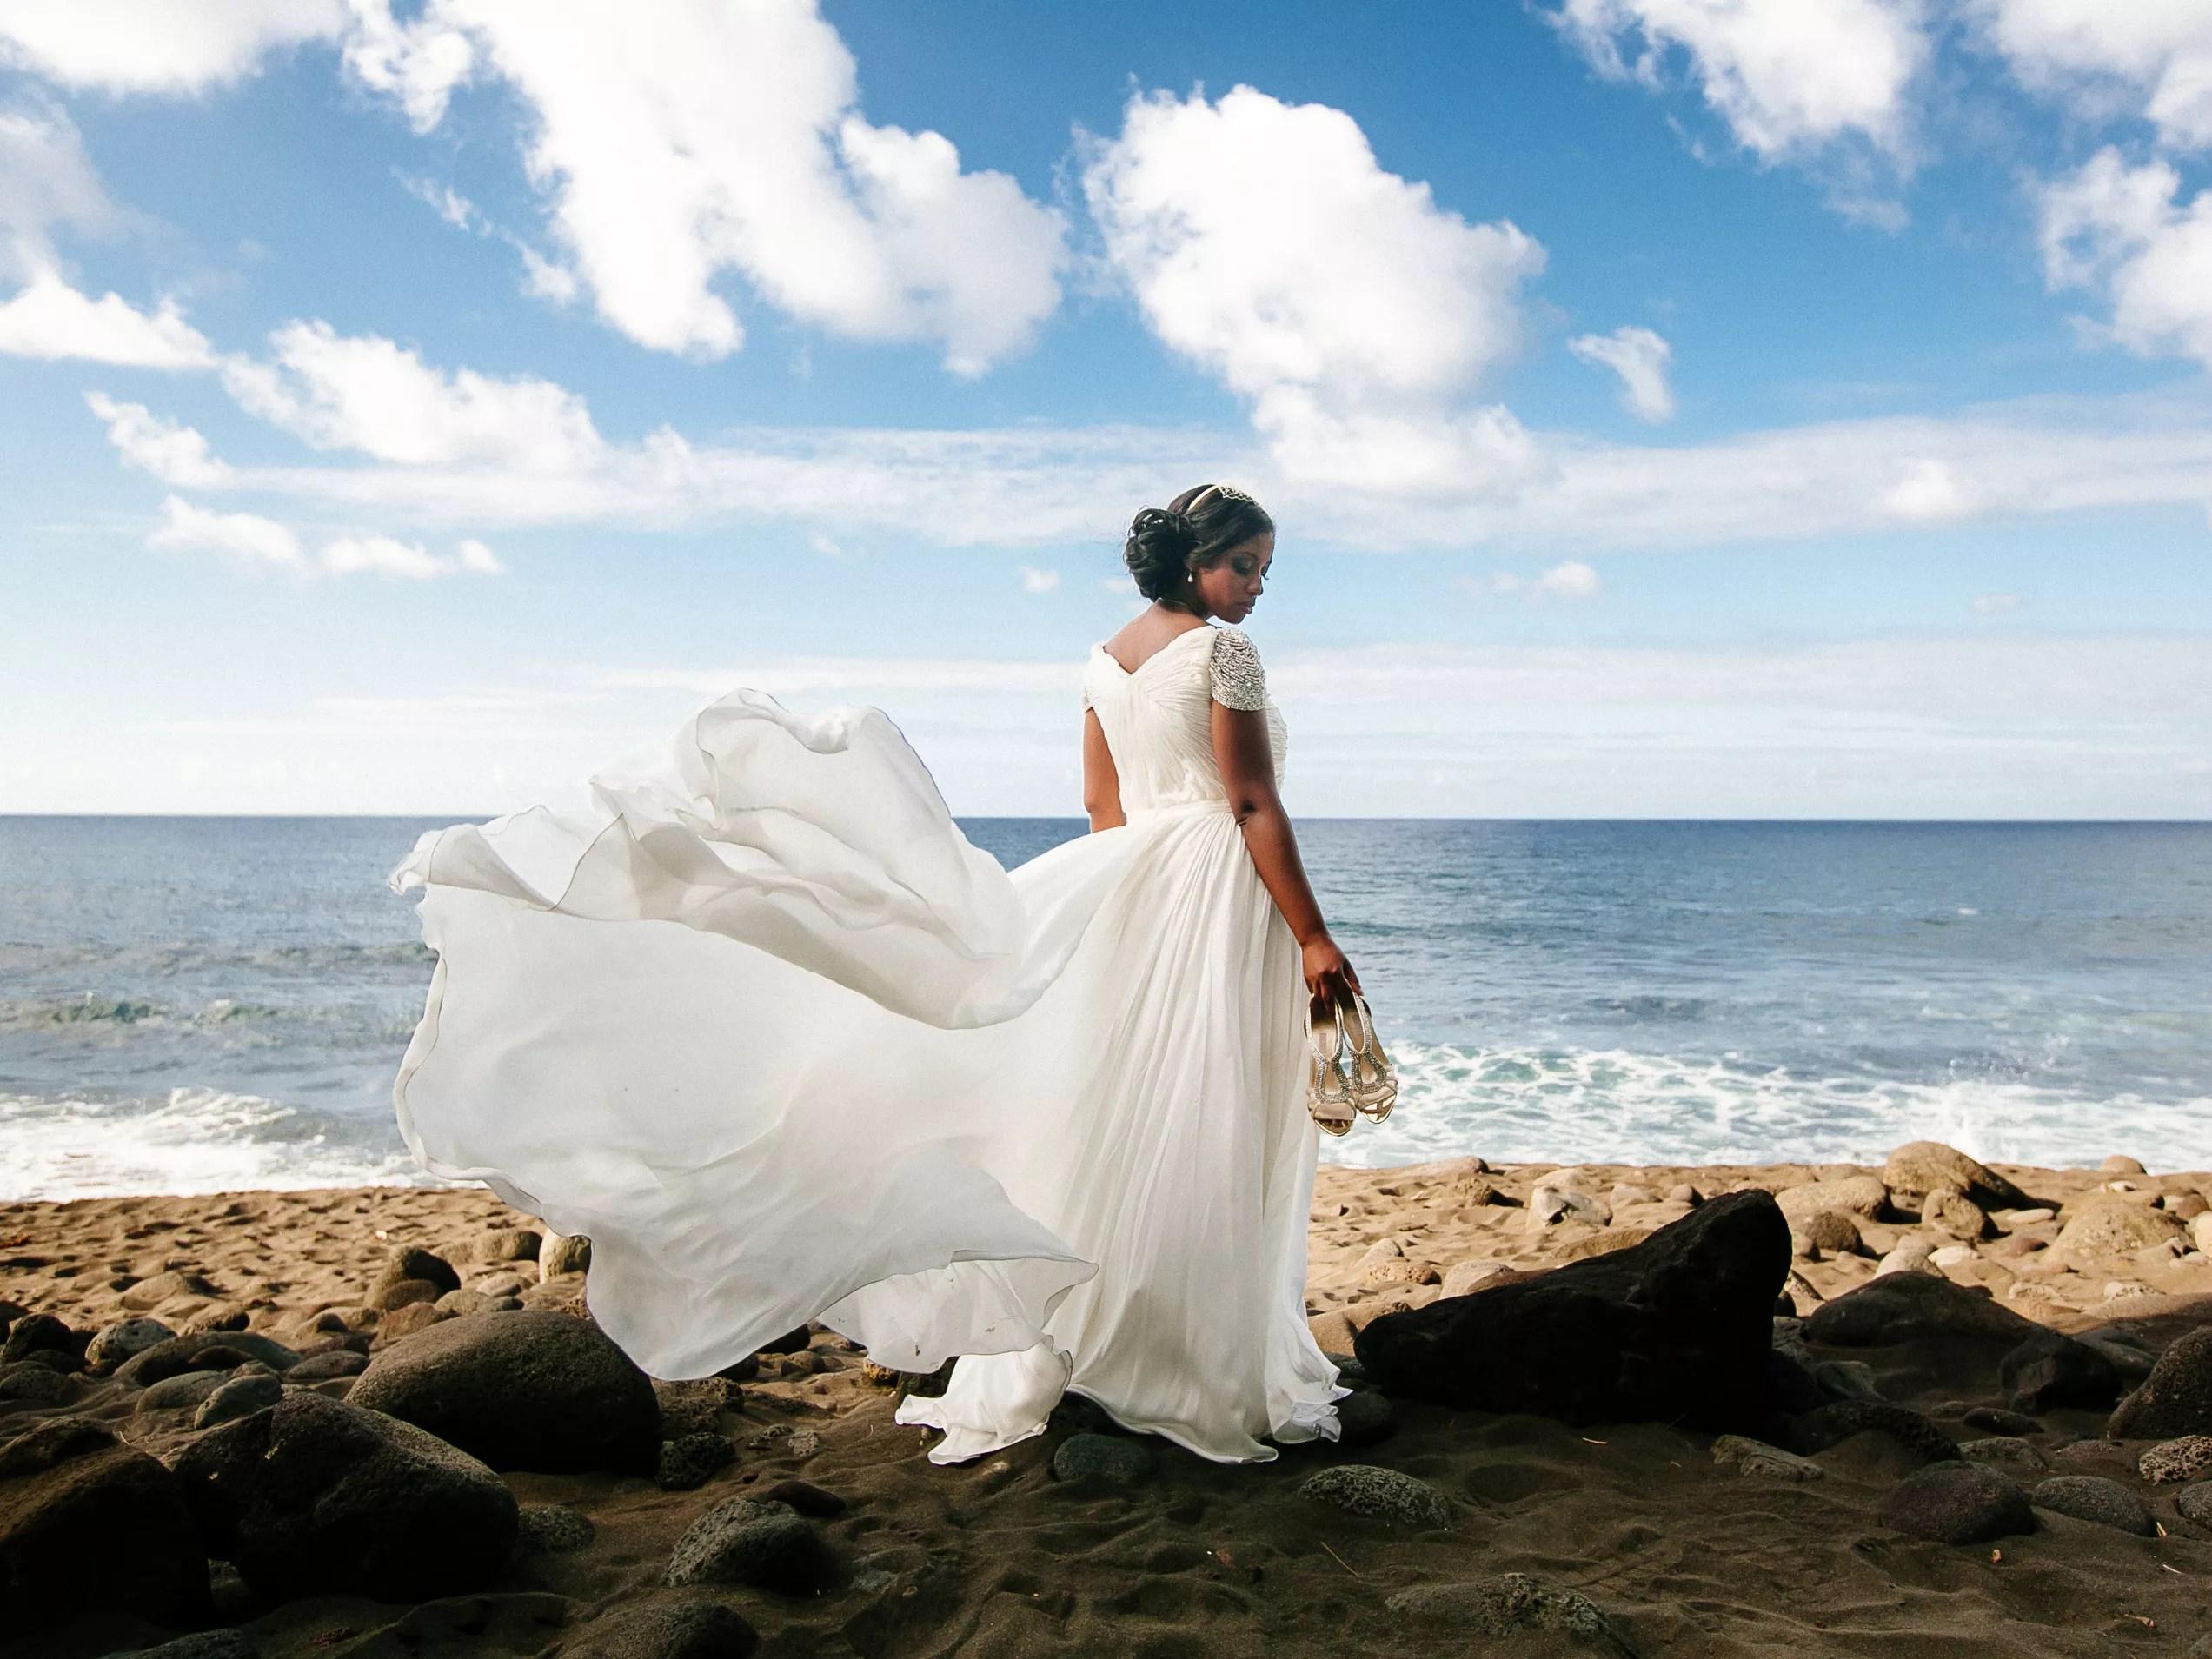 Wedding Style Dressing for Your Destination Wedding